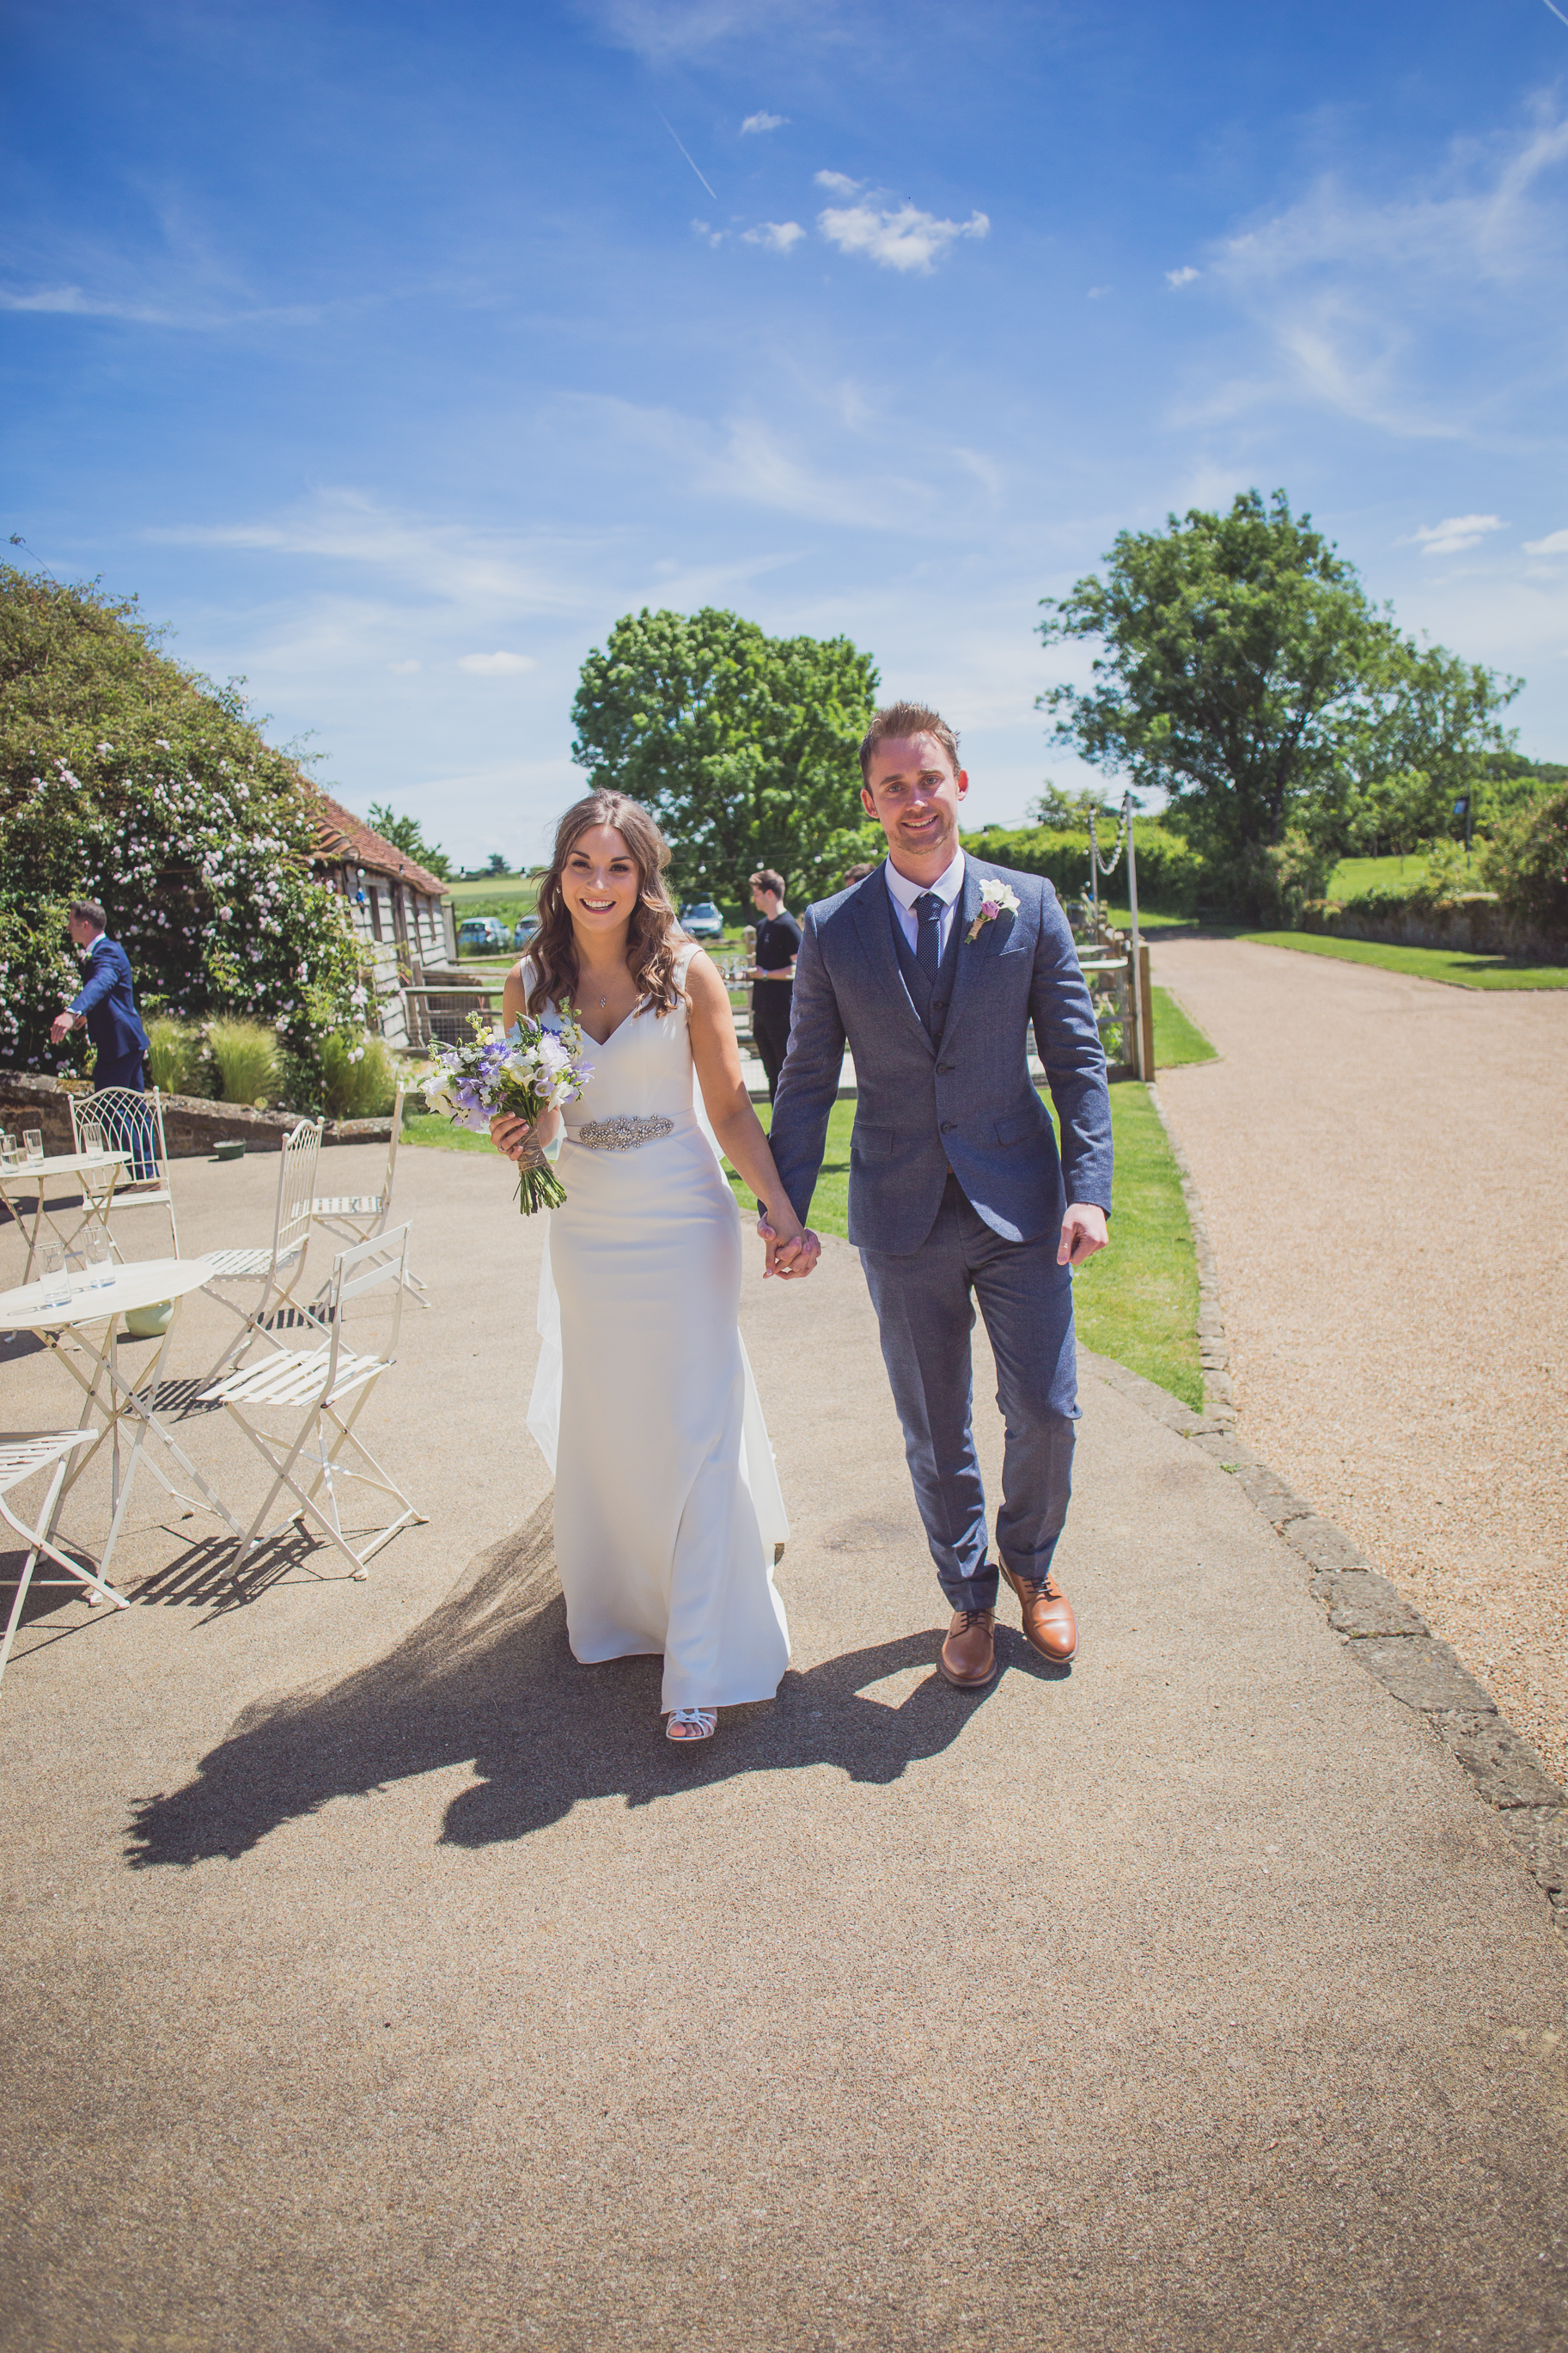 Grittenham Barn female wedding photographers west sussex petworth social-74.jpg